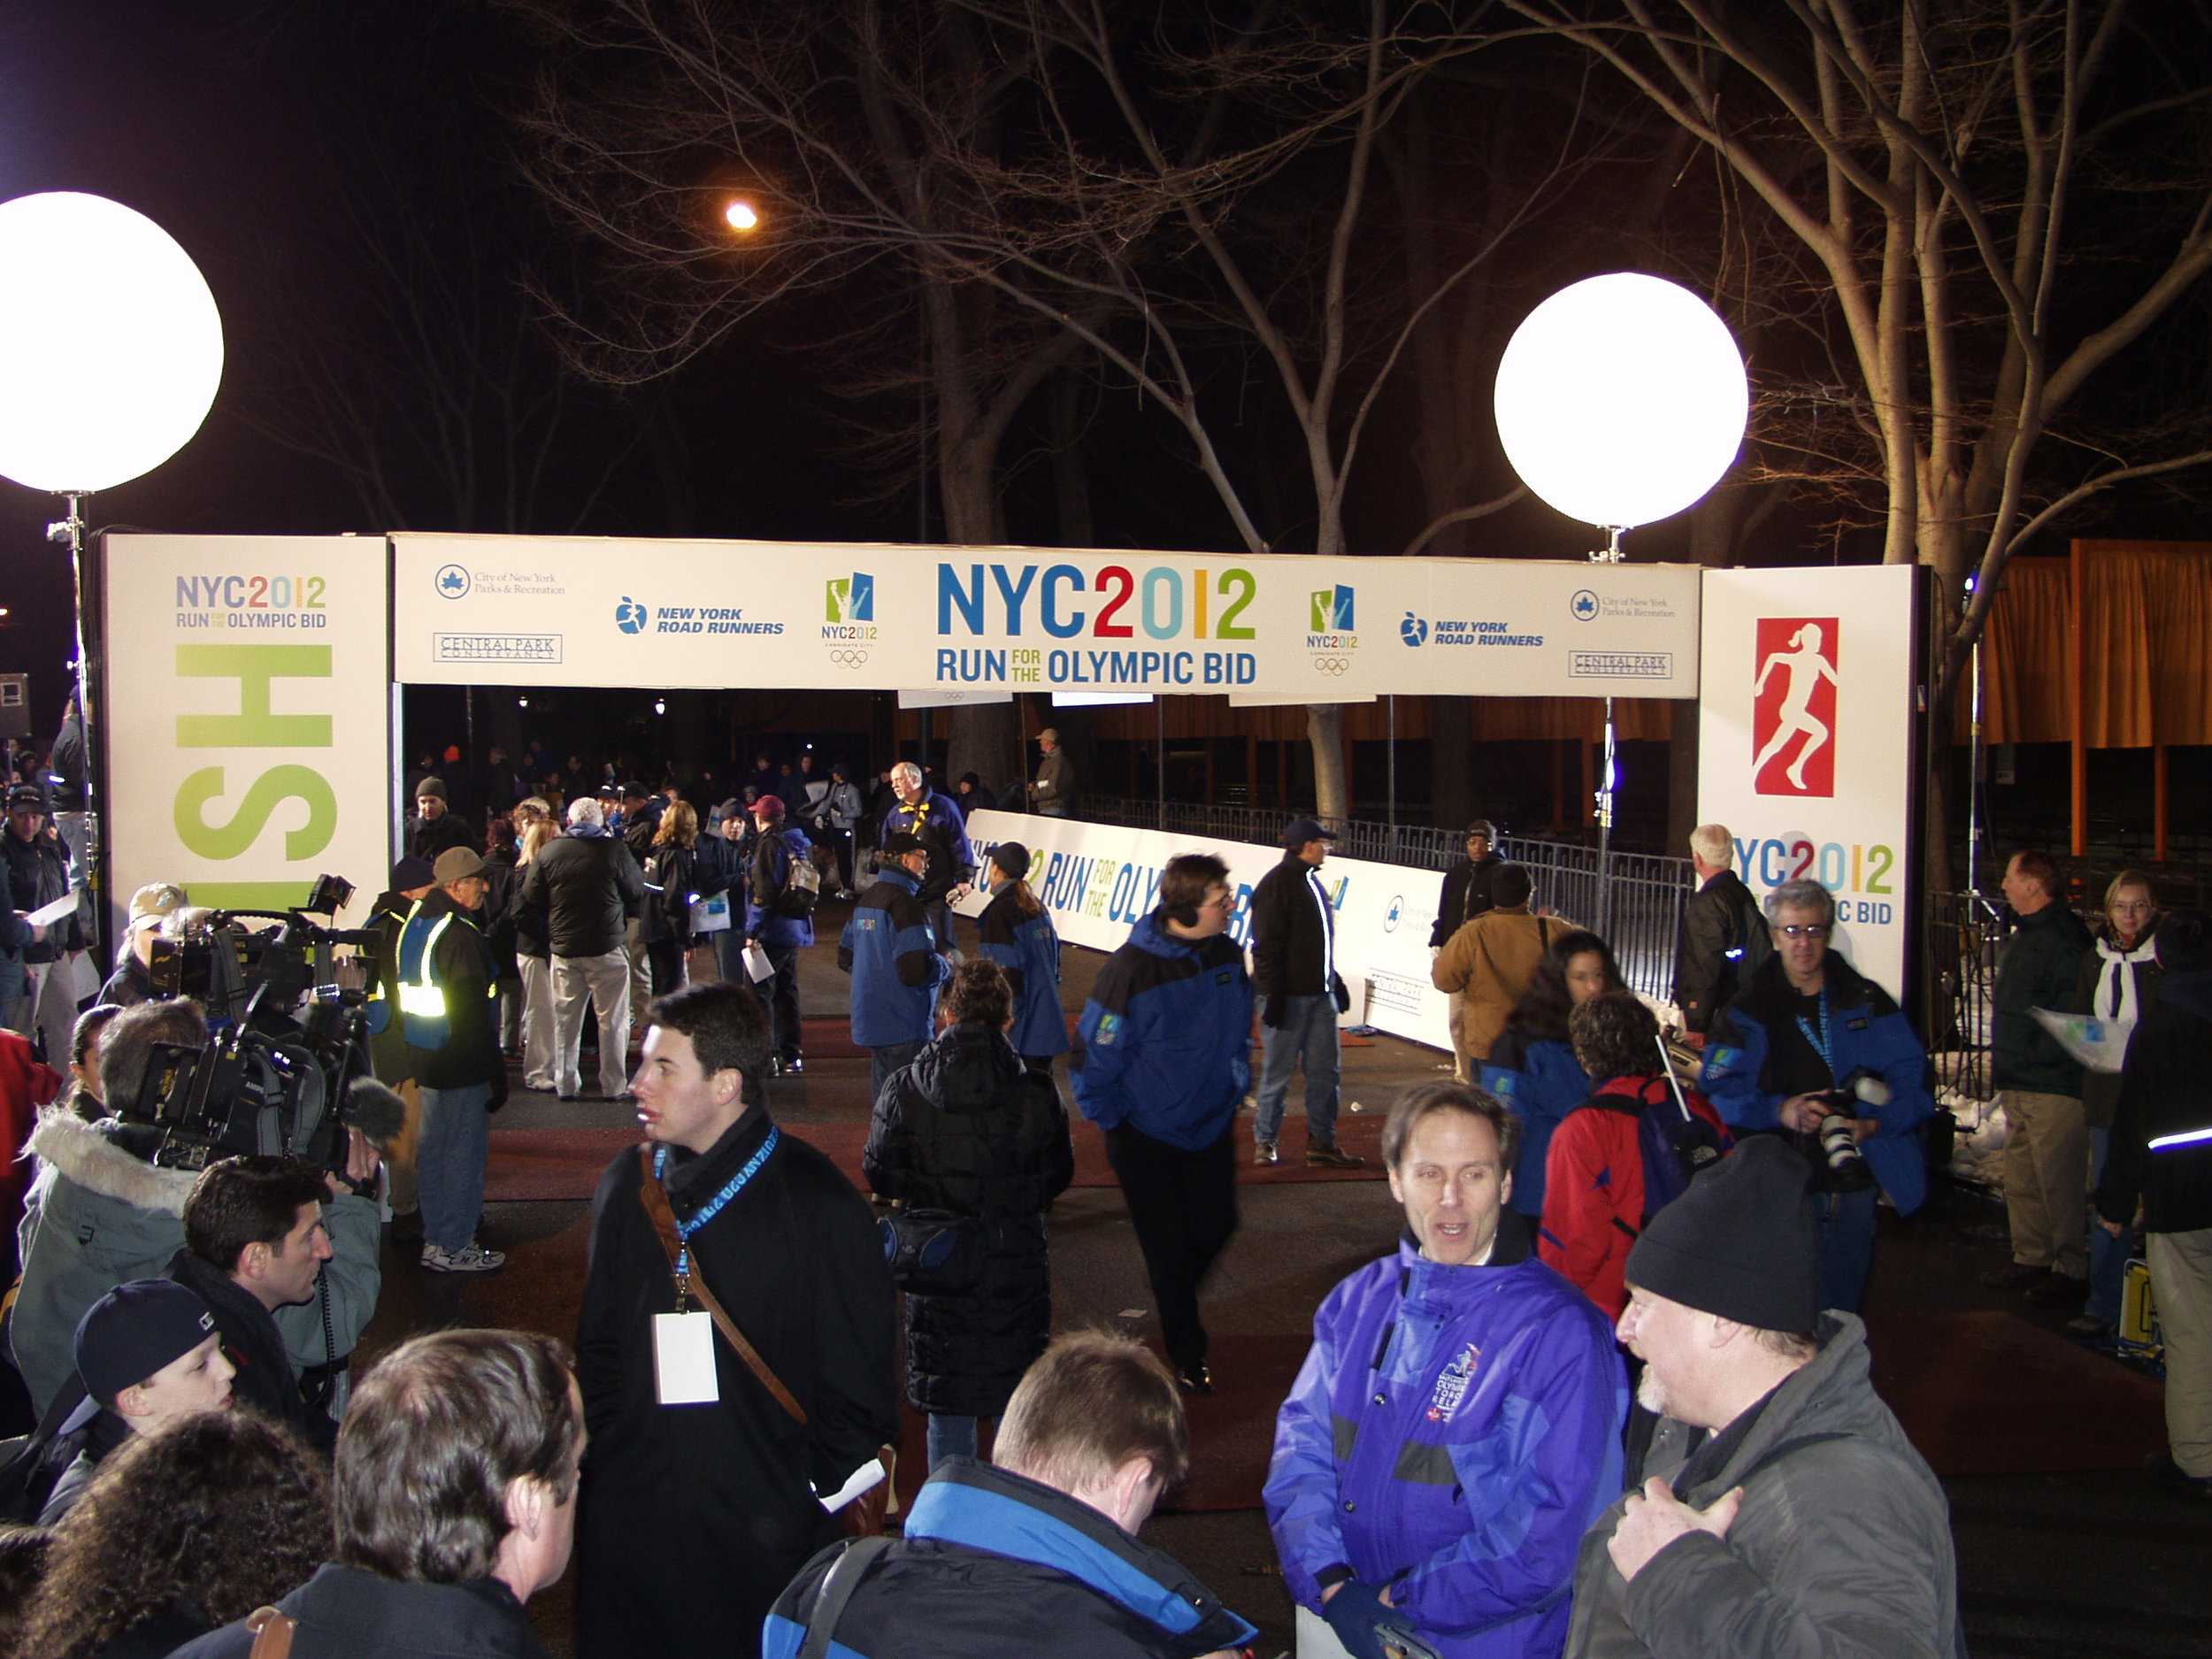 APCG_NYCOlympicBid5.JPG